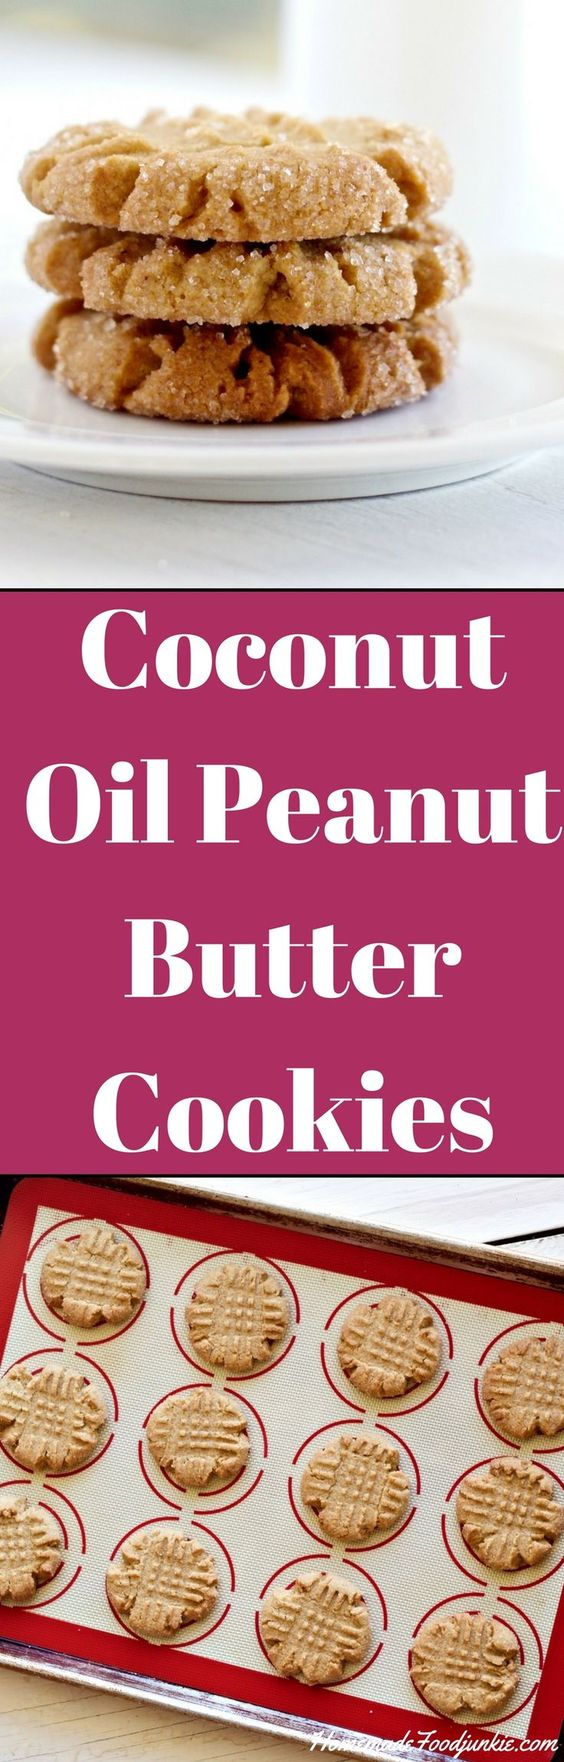 peanut butter cookies coconut oil peanut butter coconut peanuts